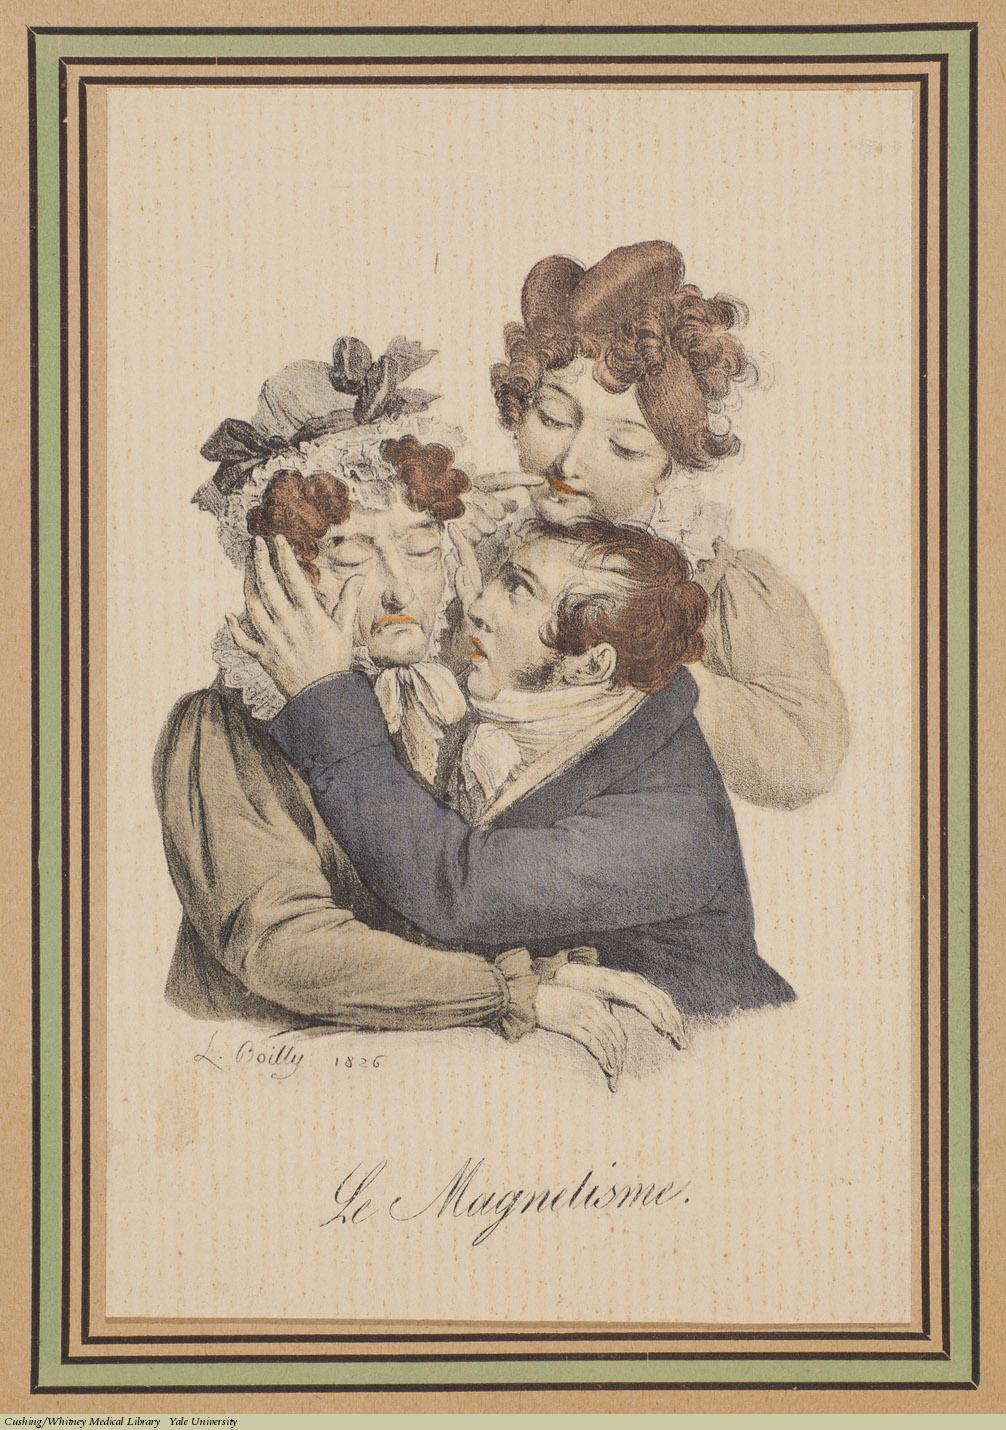 Louis-Léopold Boilly, Le Magnetisme (Hypnotism), Lithograph, 1826.